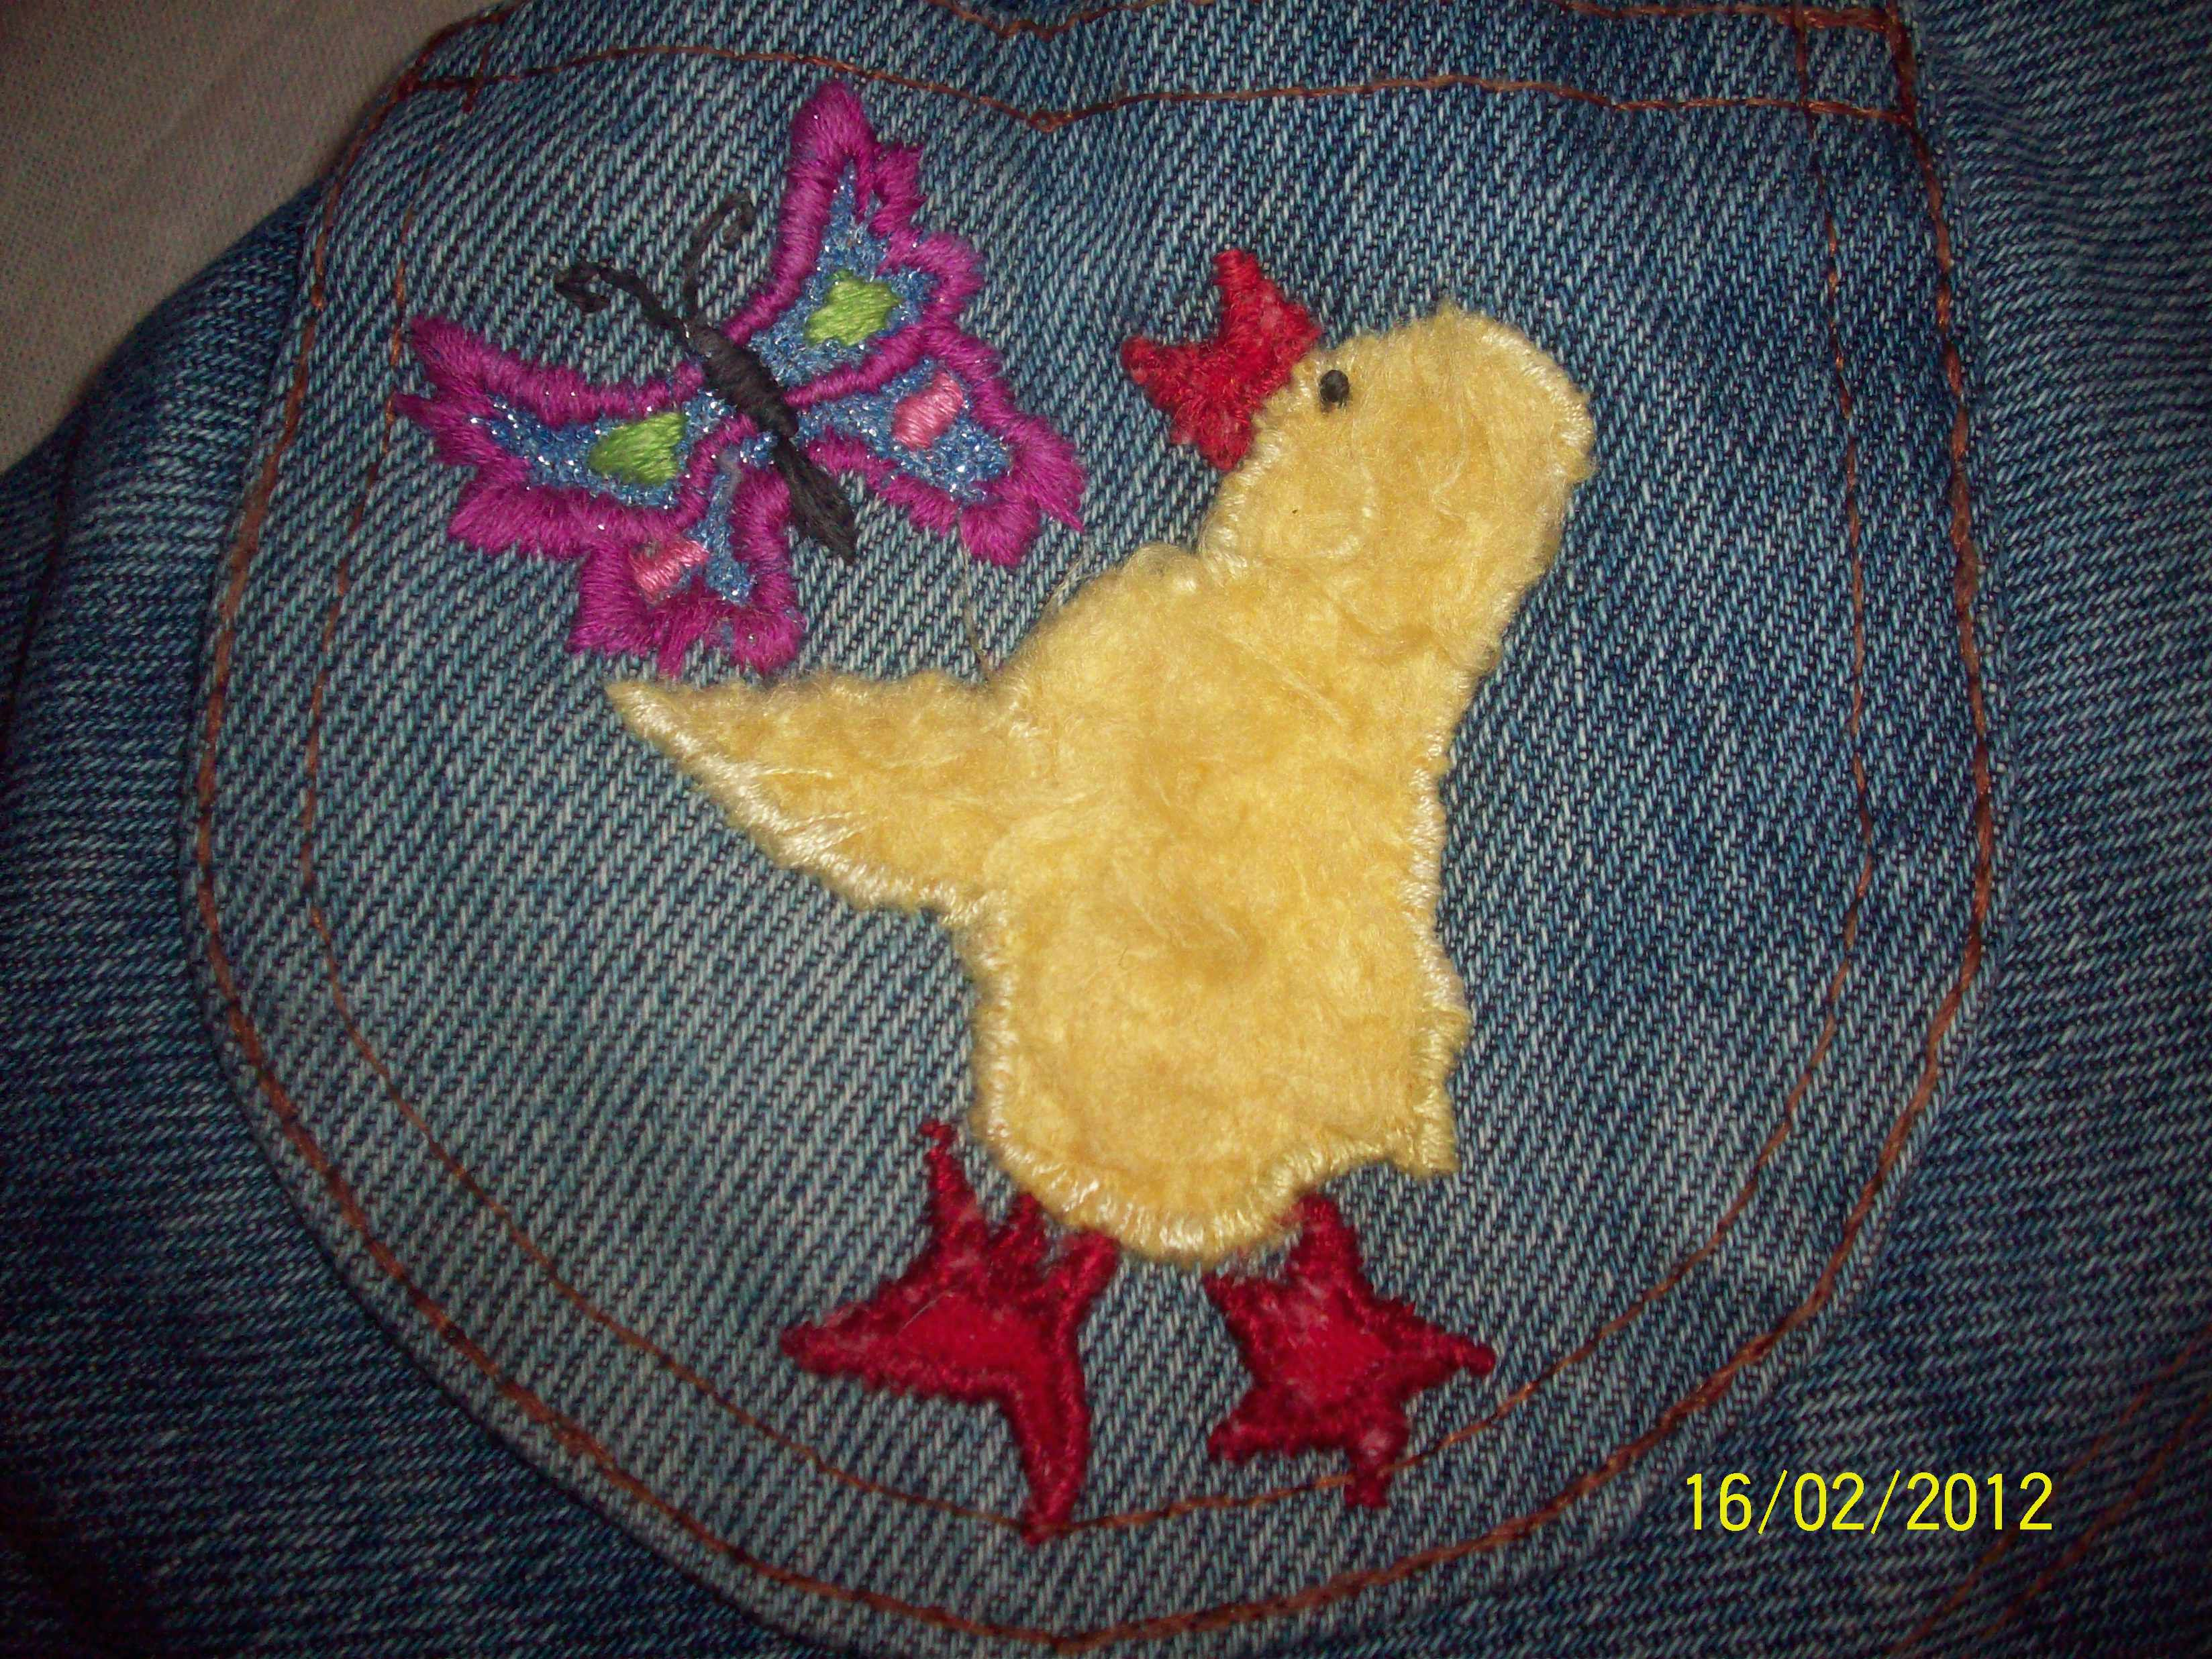 Цыплёнок с бабочкой